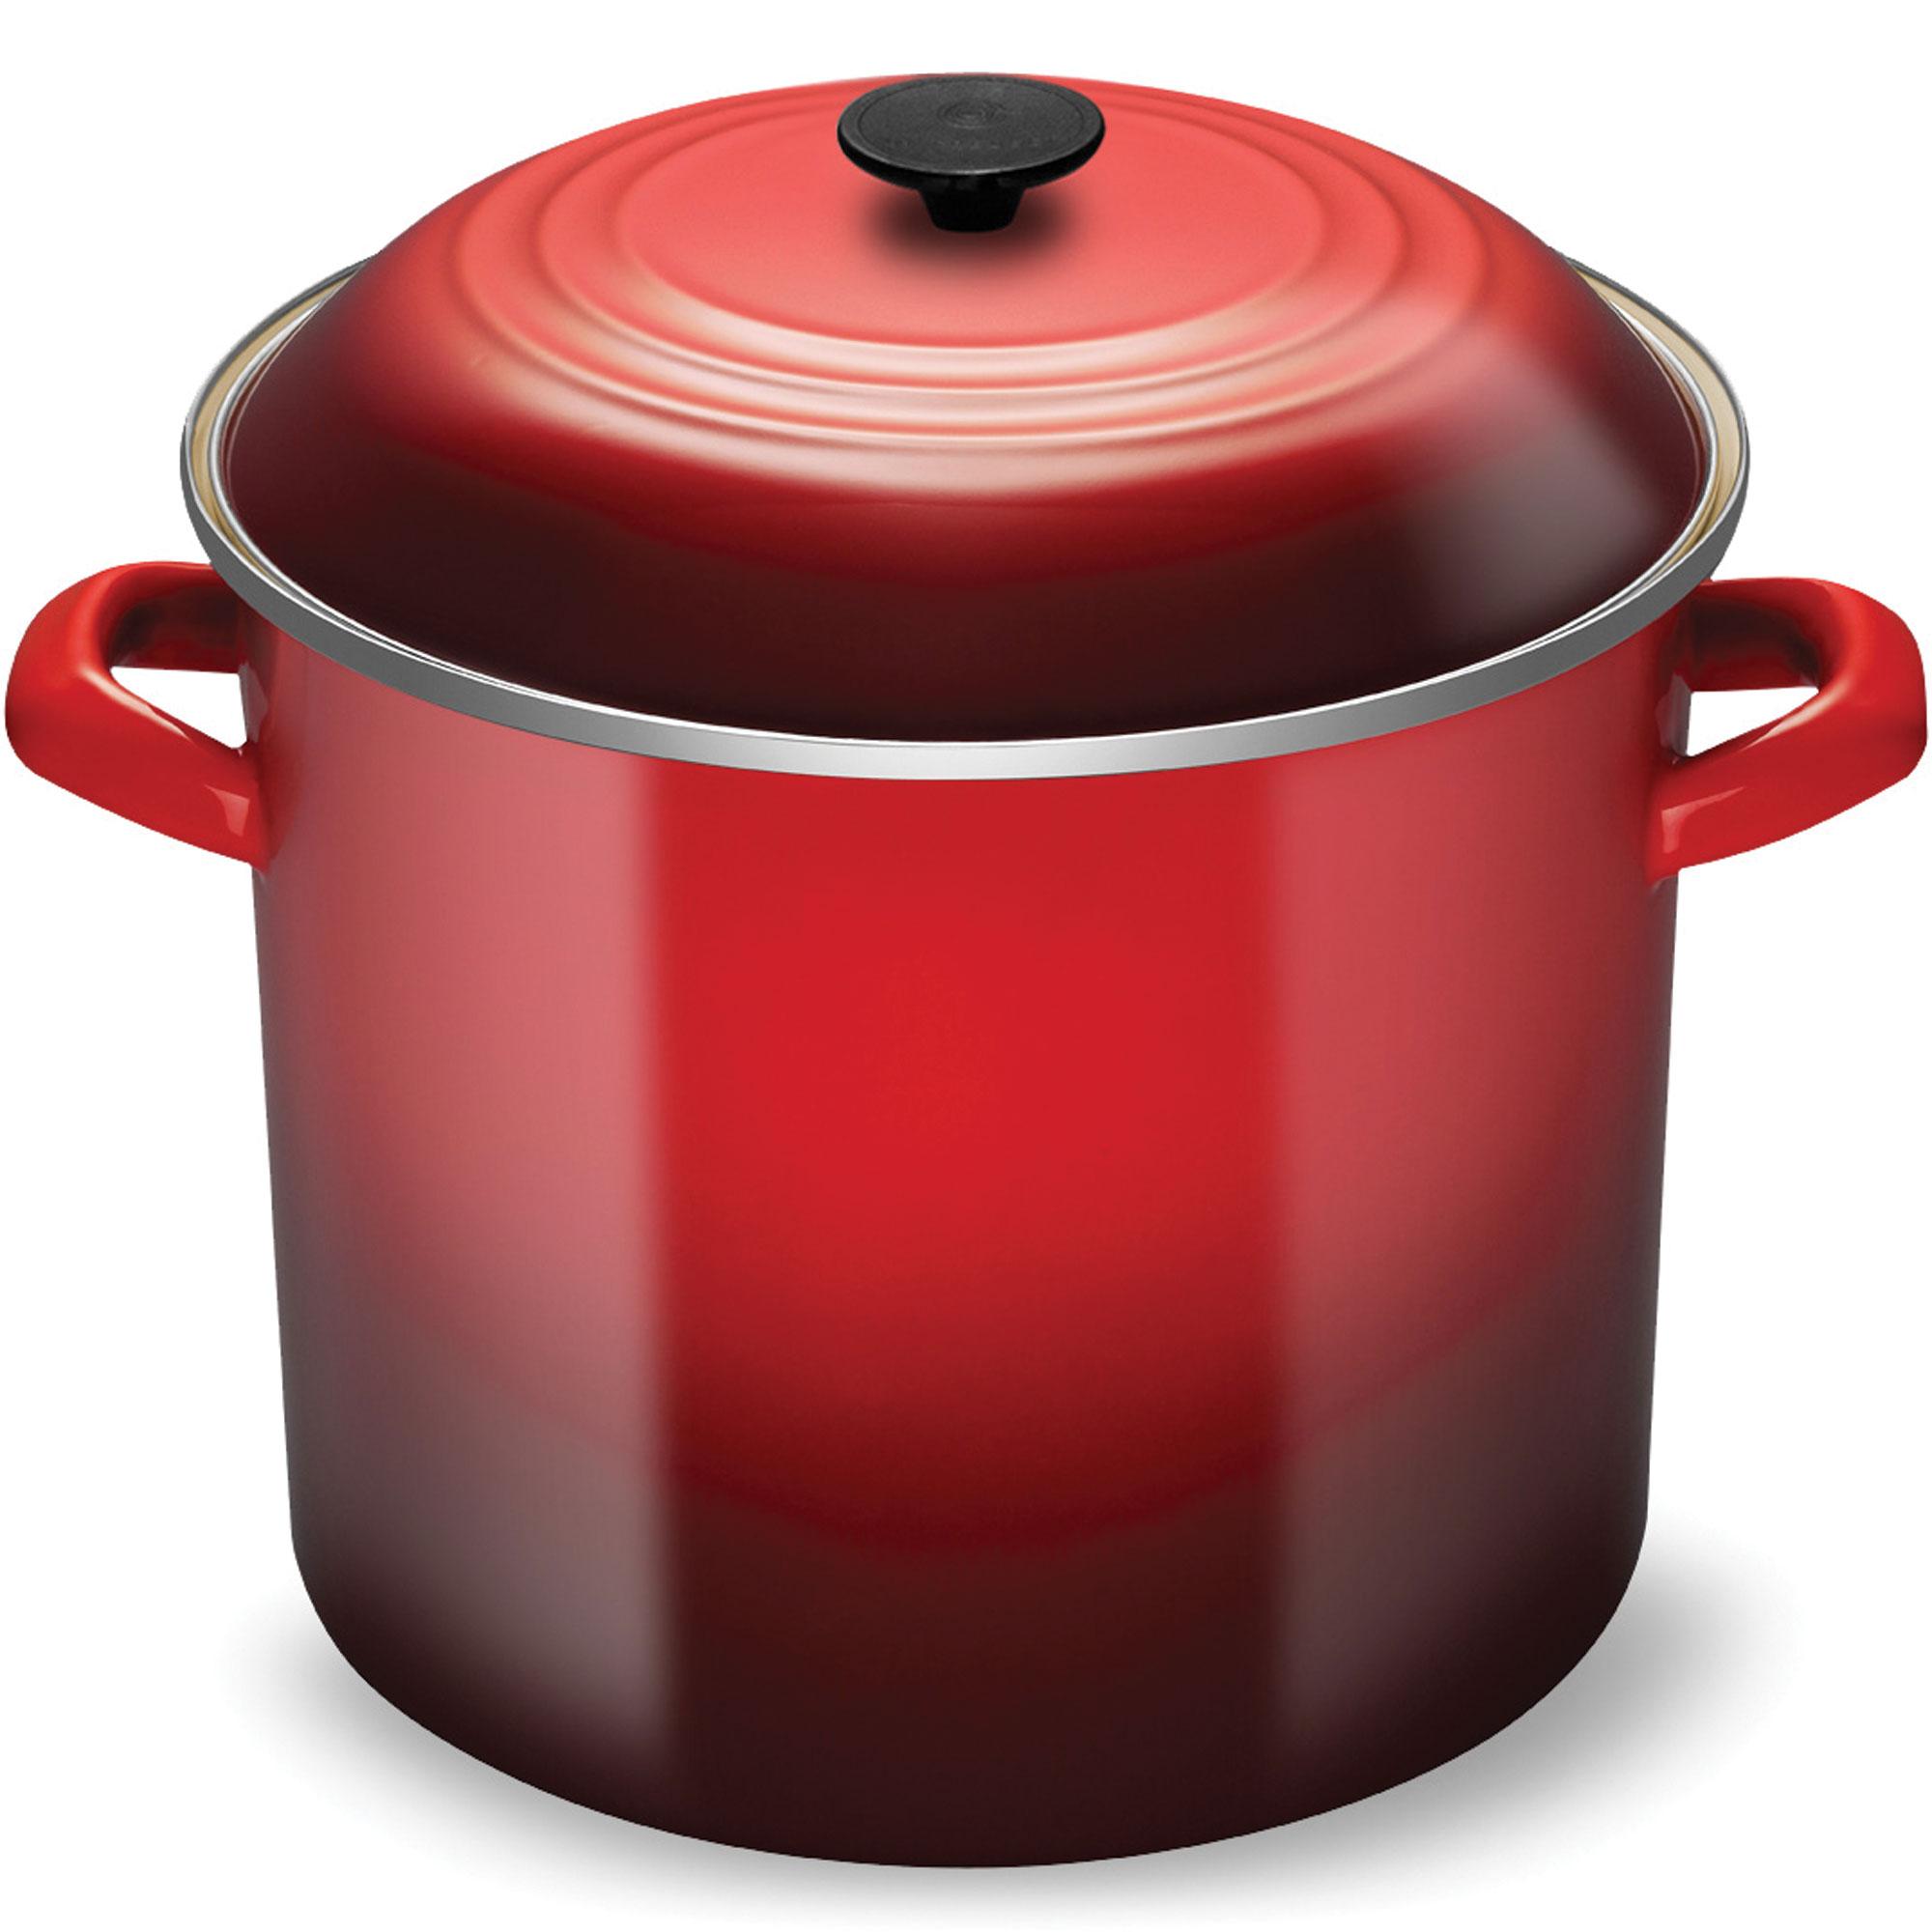 Le Creuset Enameled Steel Stock Pot 20 Quart Cherry Red